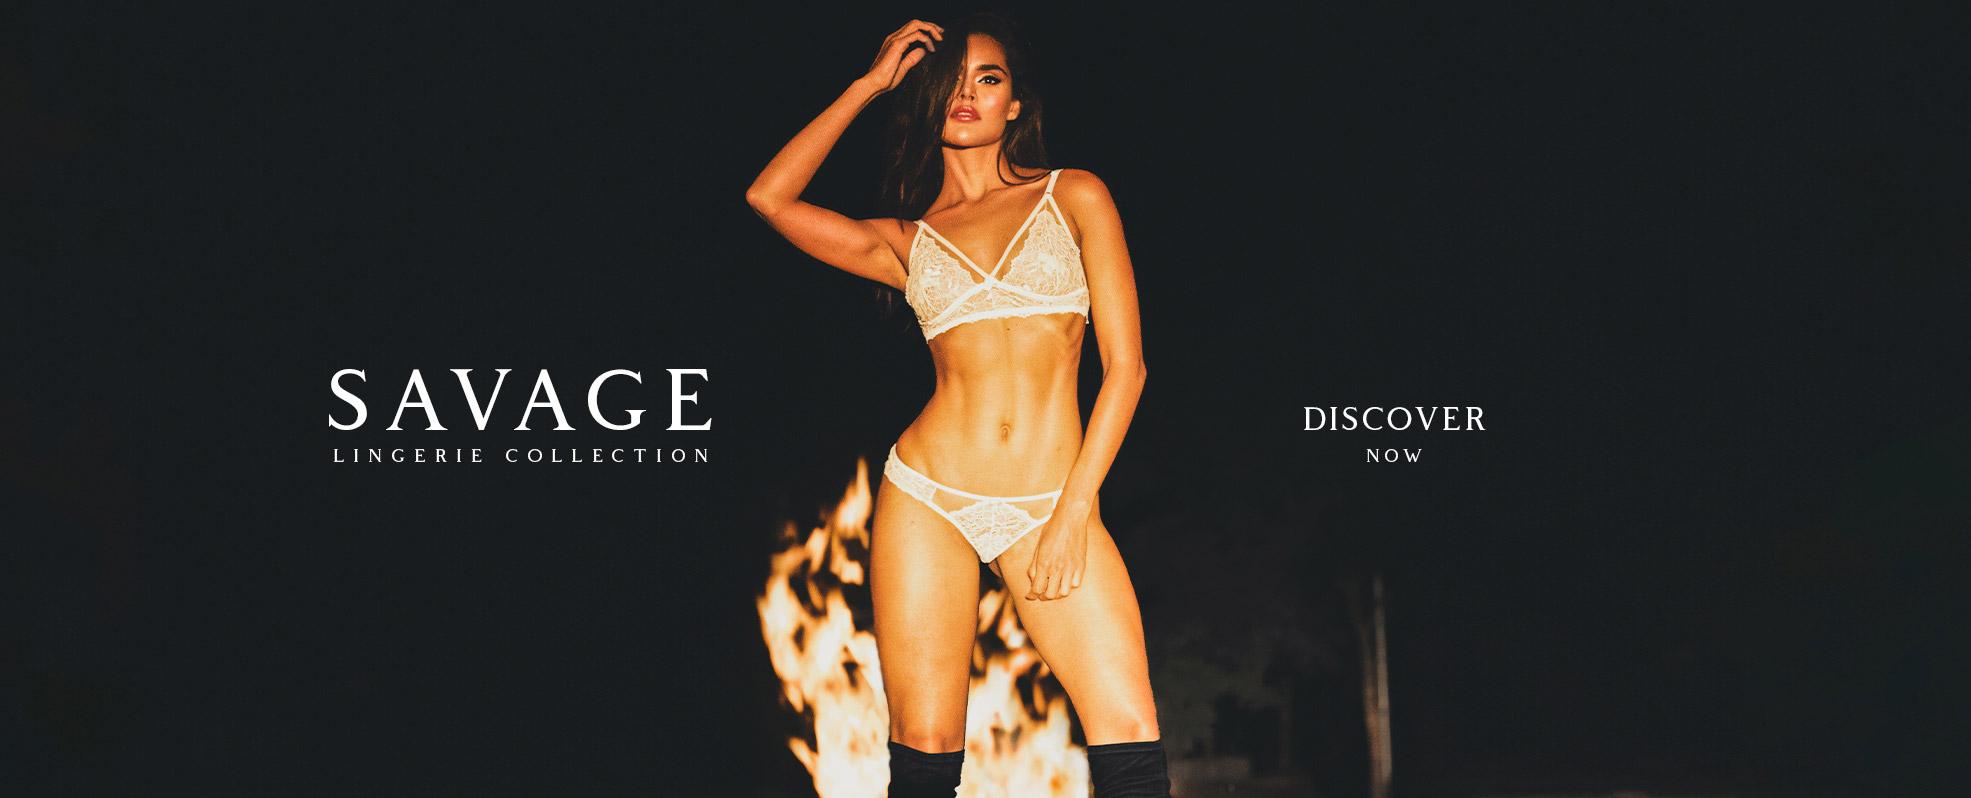 Savage Collection